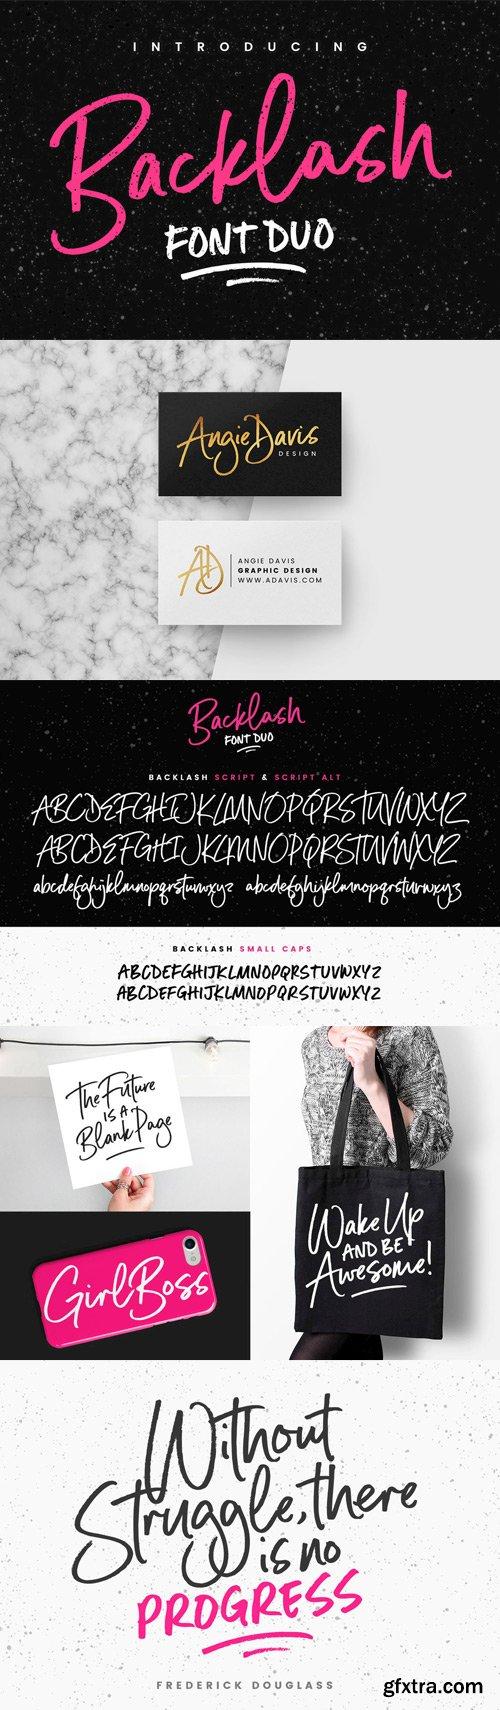 CM - Backlash Font Duo - 1694188